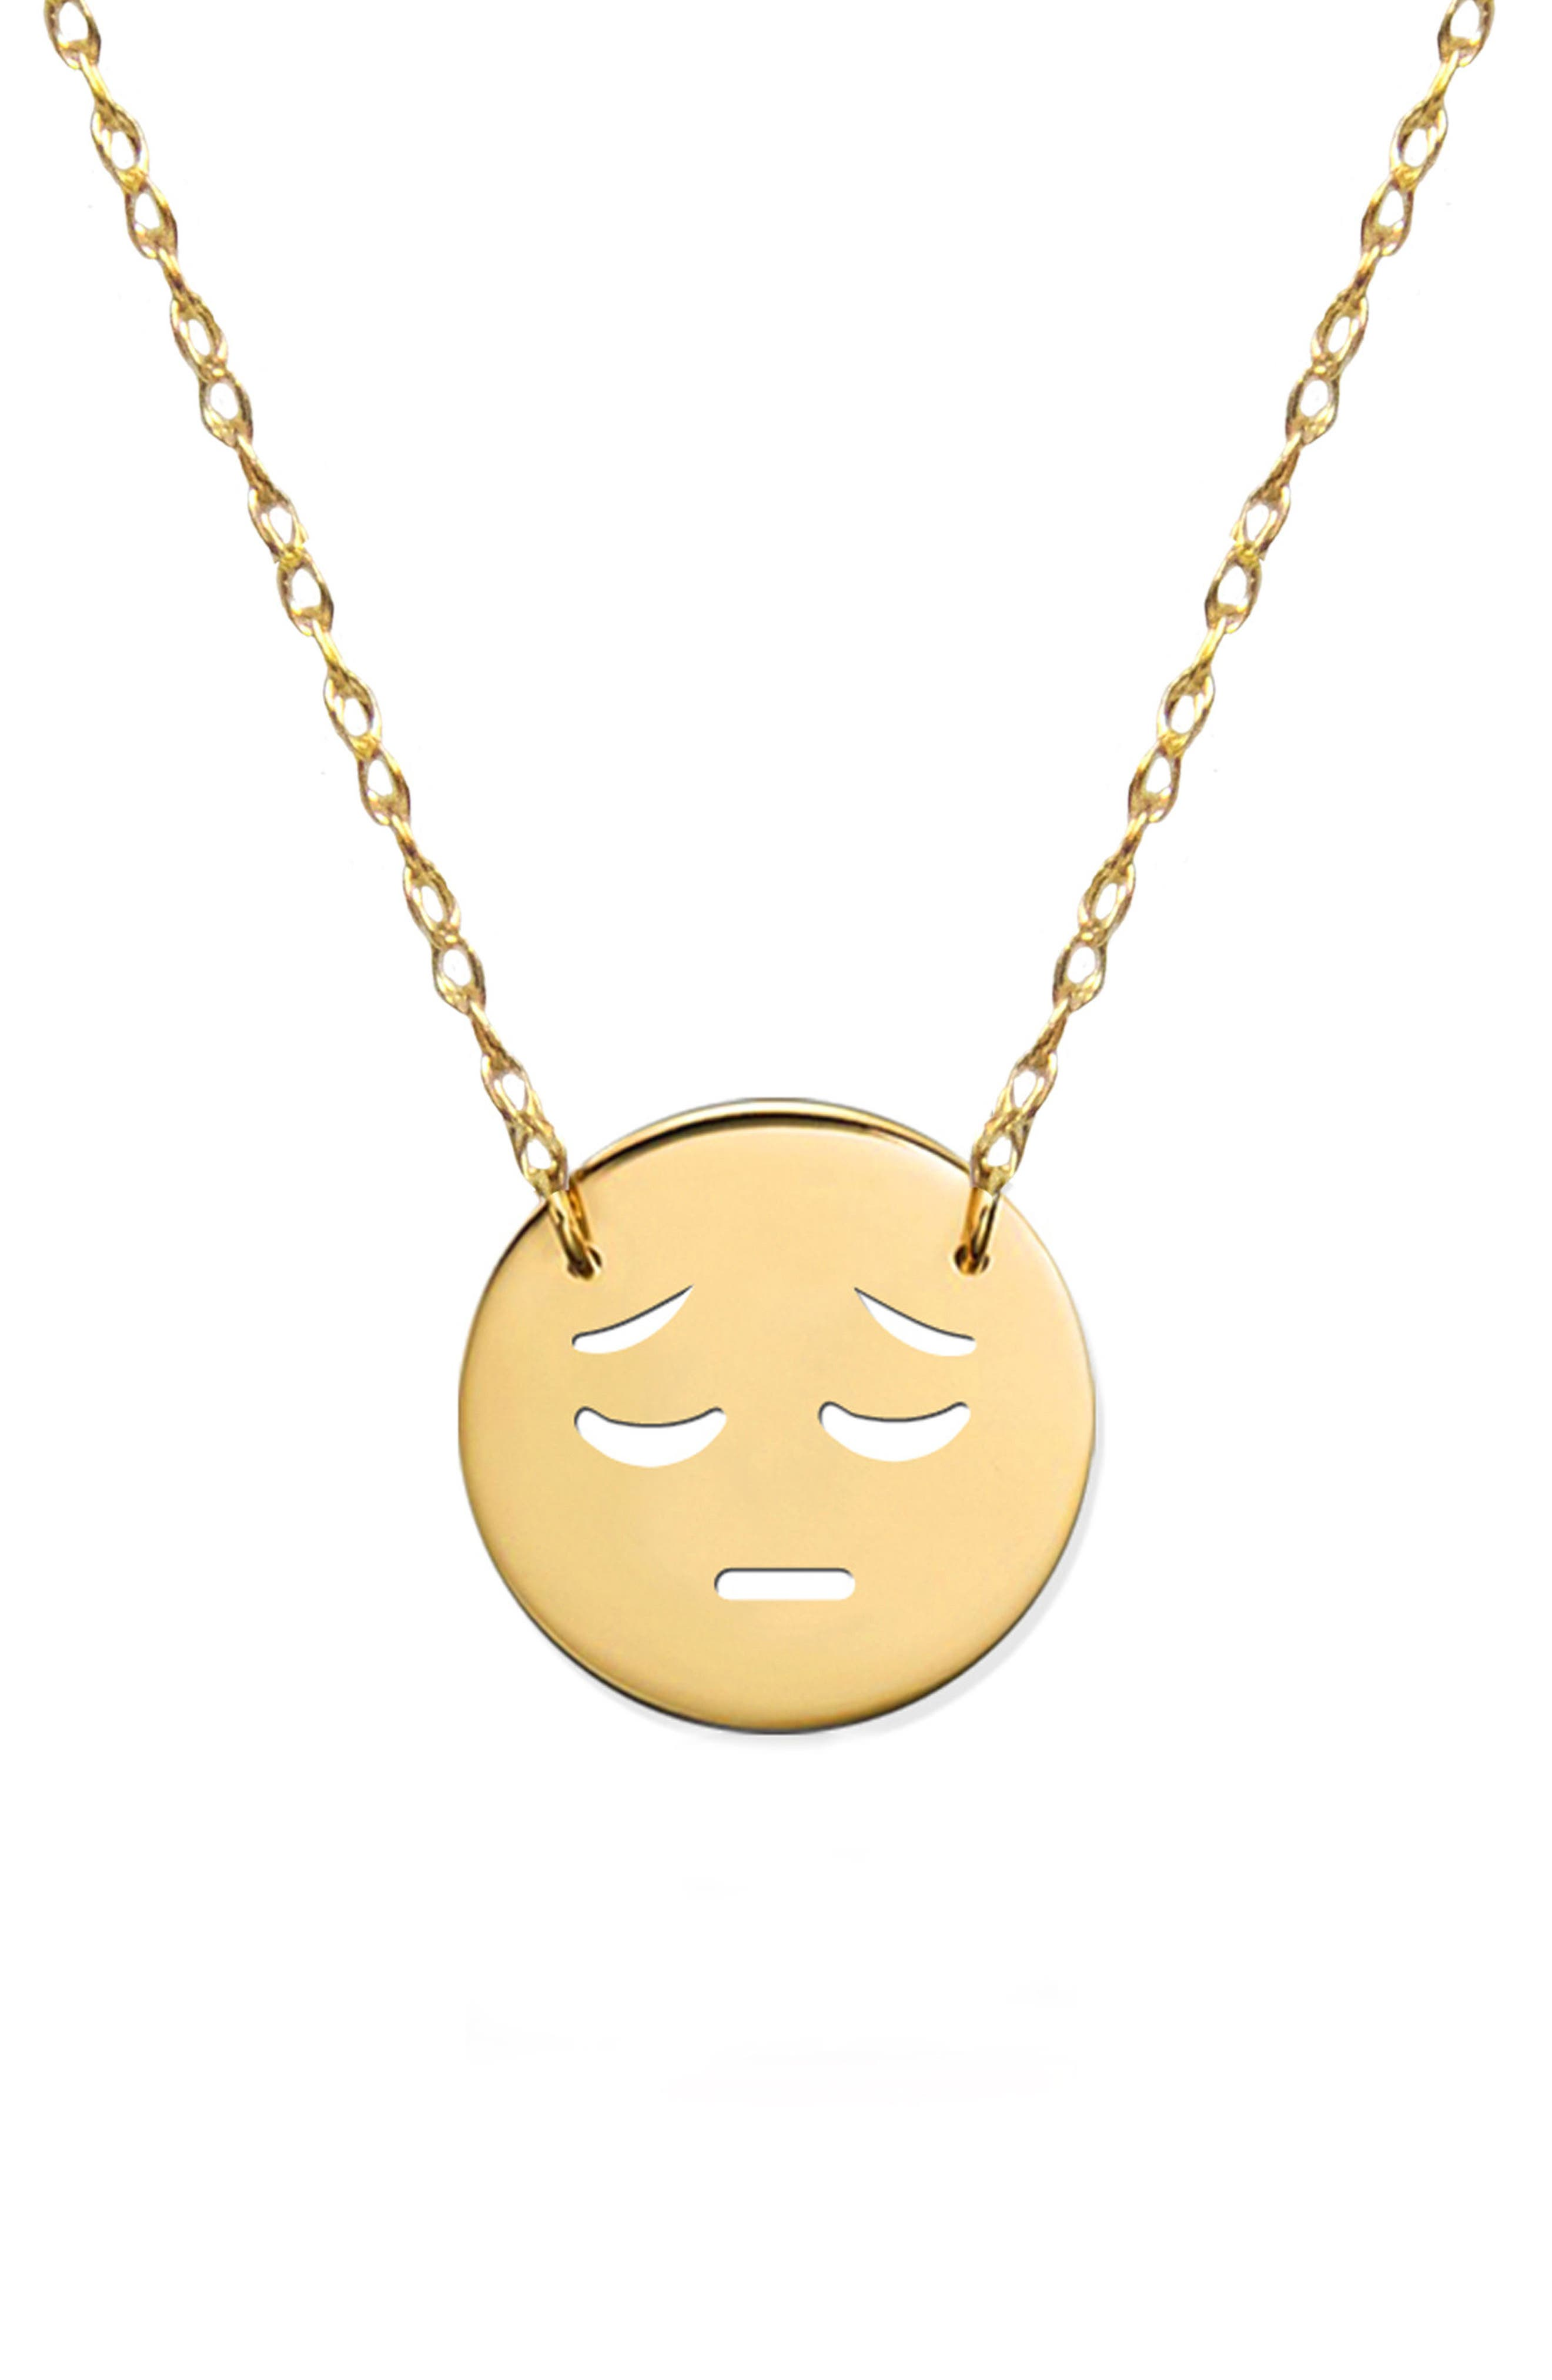 Sad Emoji Pendant Necklace,                             Main thumbnail 1, color,